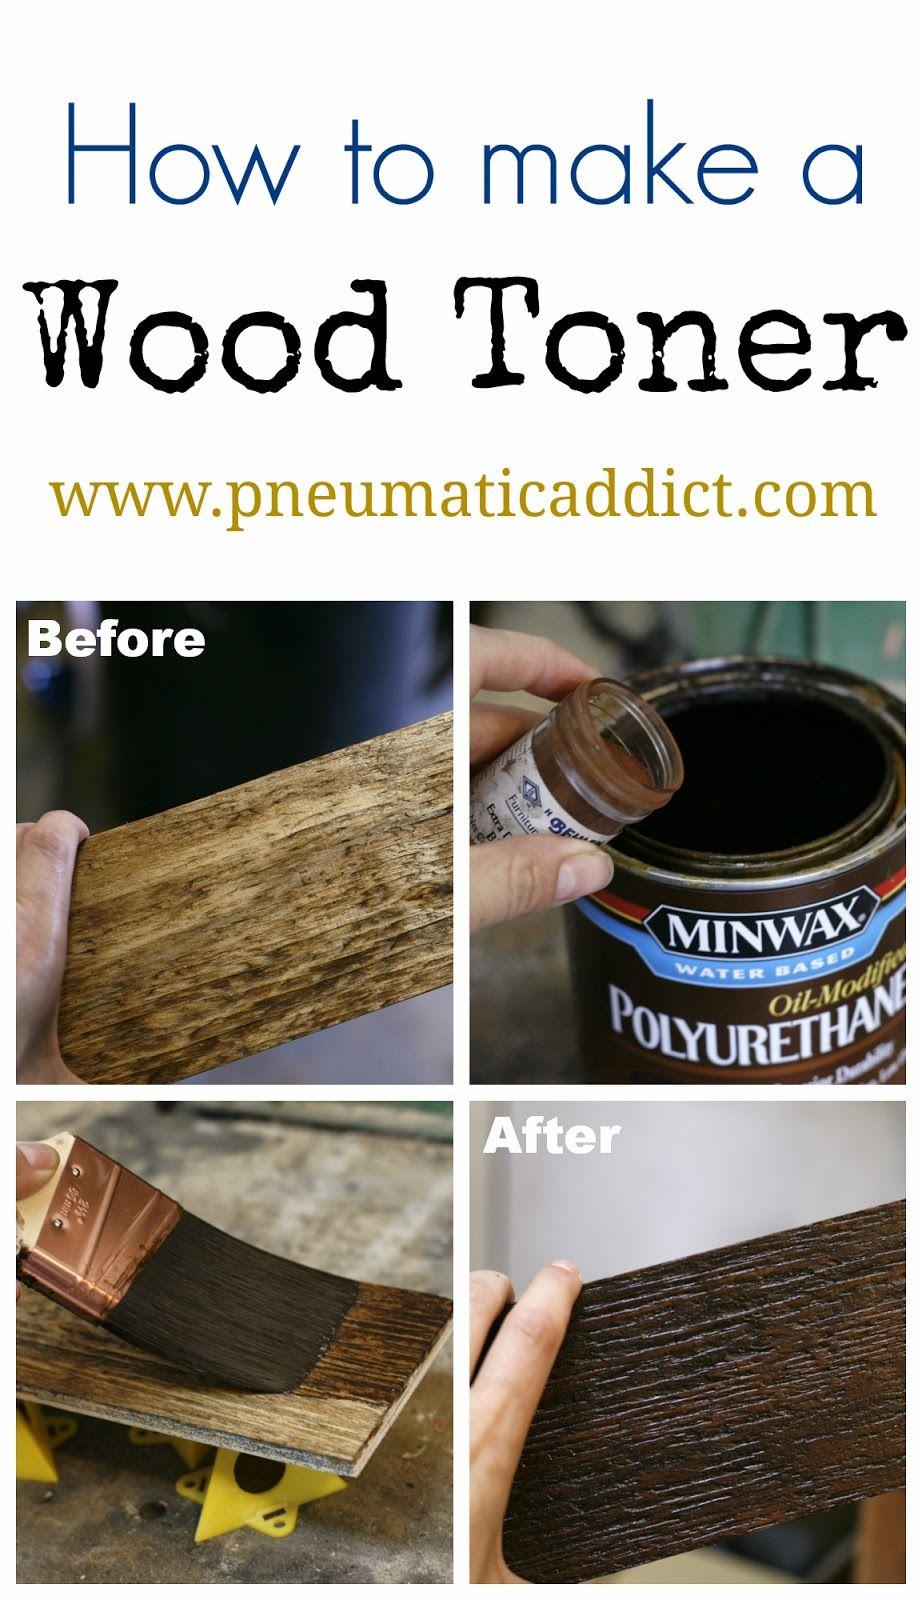 How to Make a Wood Toner Diy painting, Wood, Diy